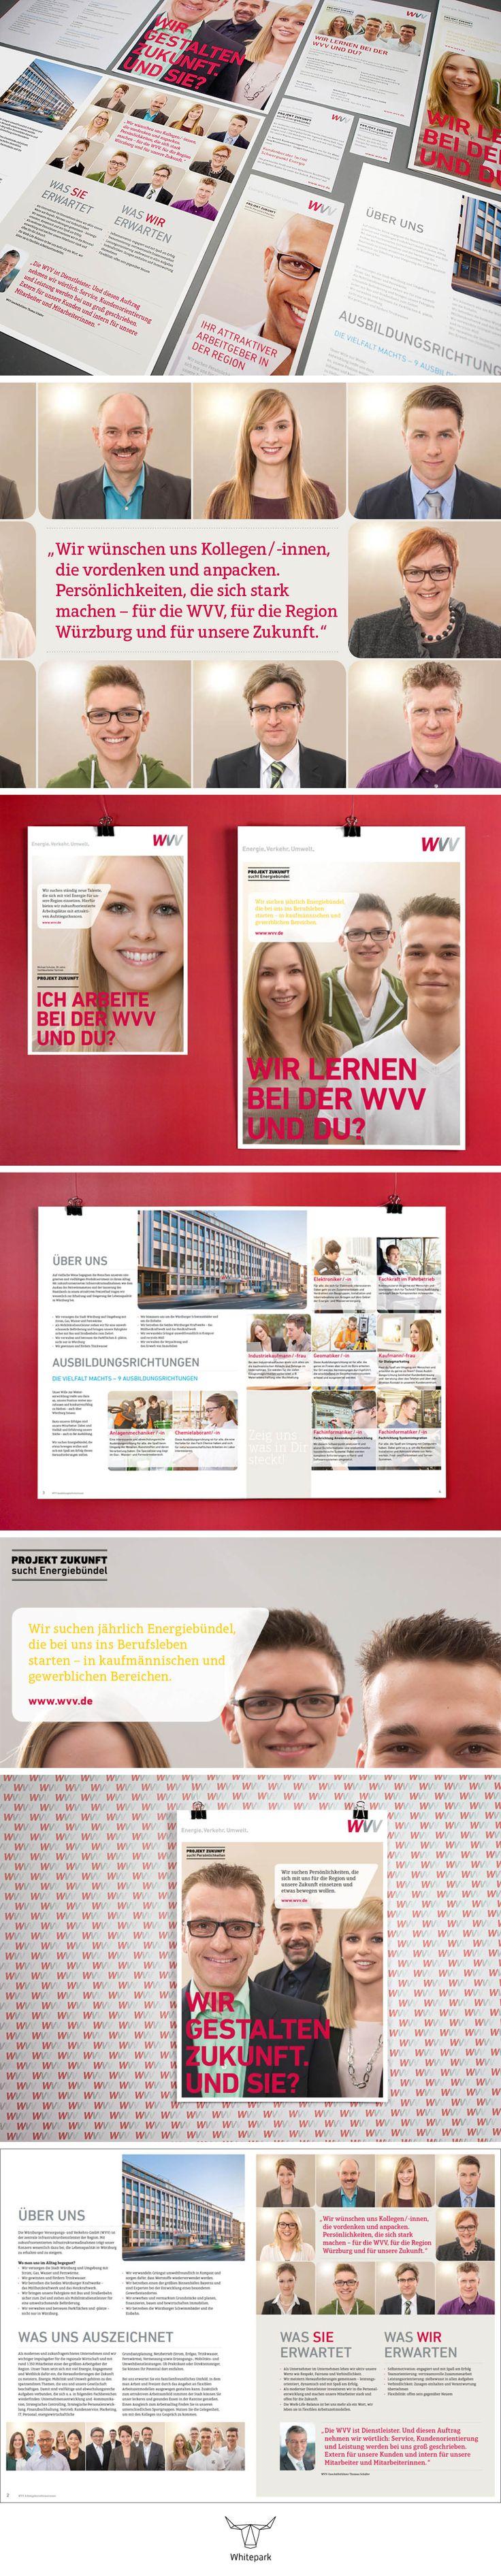 WVV Employer Branding Campaign / Kampagne © Whitepark #employerbranding #campaign #kampagne